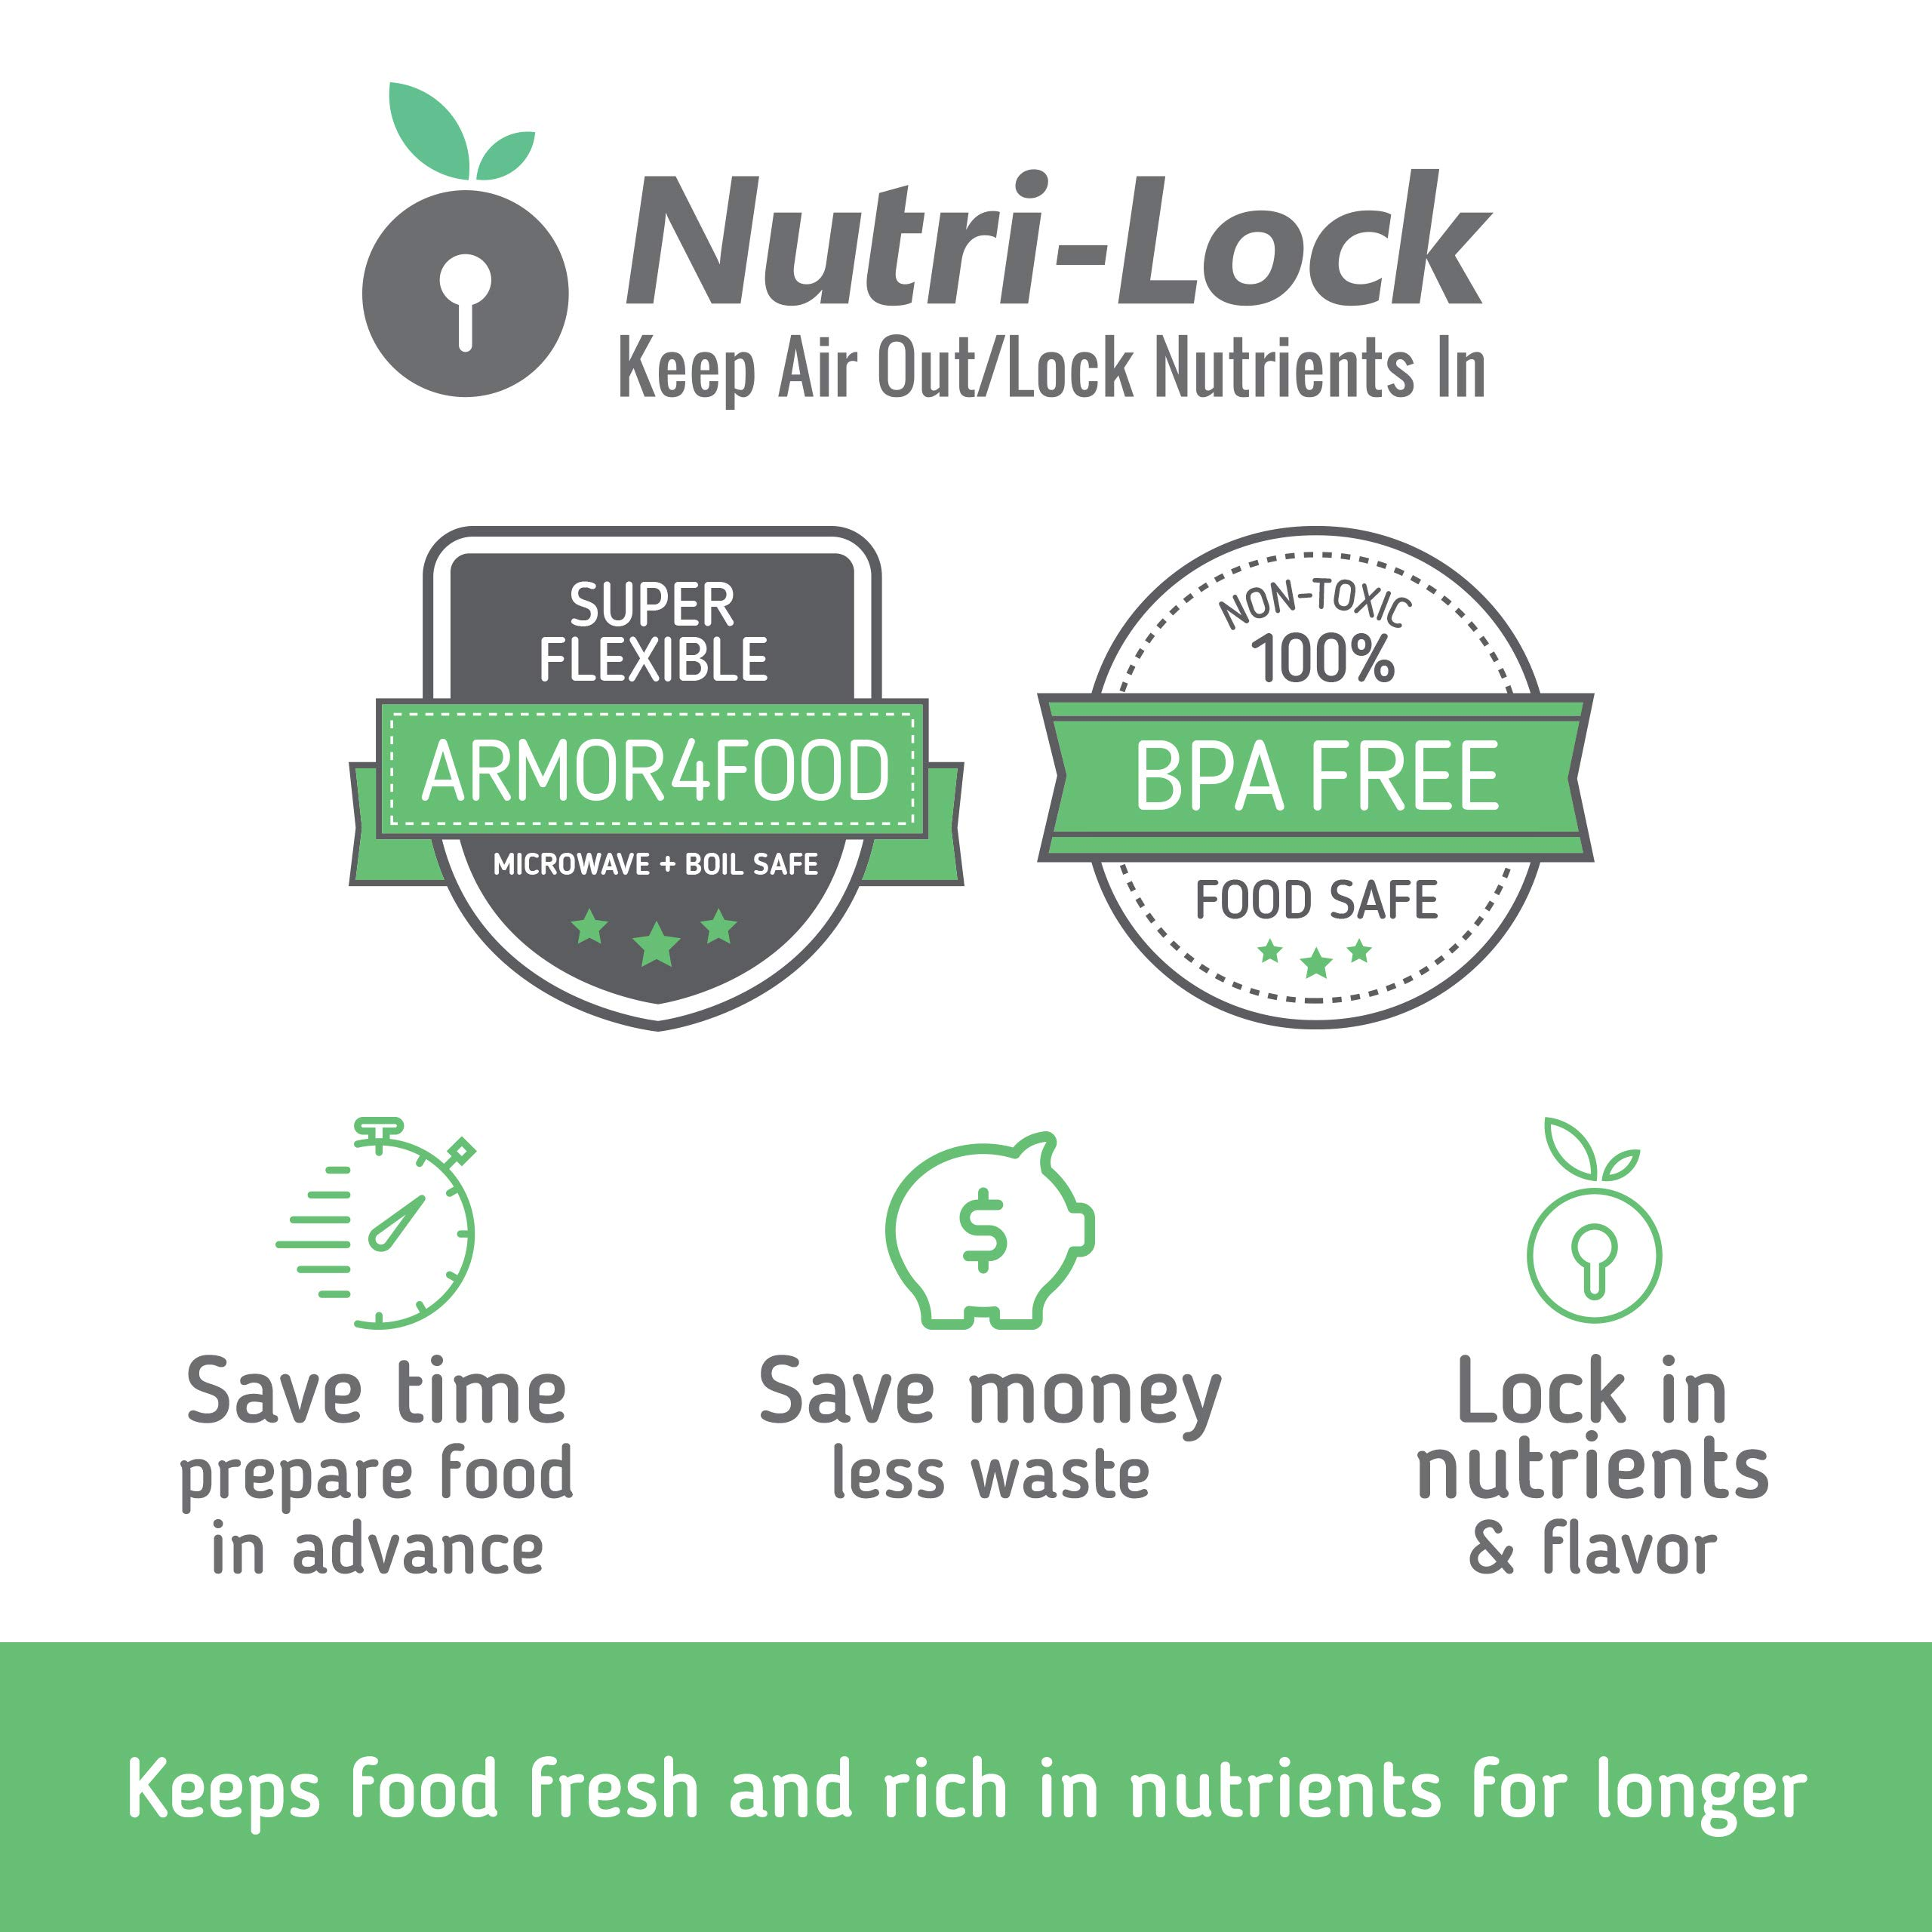 Nutri-Lock Vacuum Sealer Bags. 100 Gallon Bags 11x16 Inch. Commercial Grade Food Sealer Bags for FoodSaver, Sous Vide by Nutri-Lock